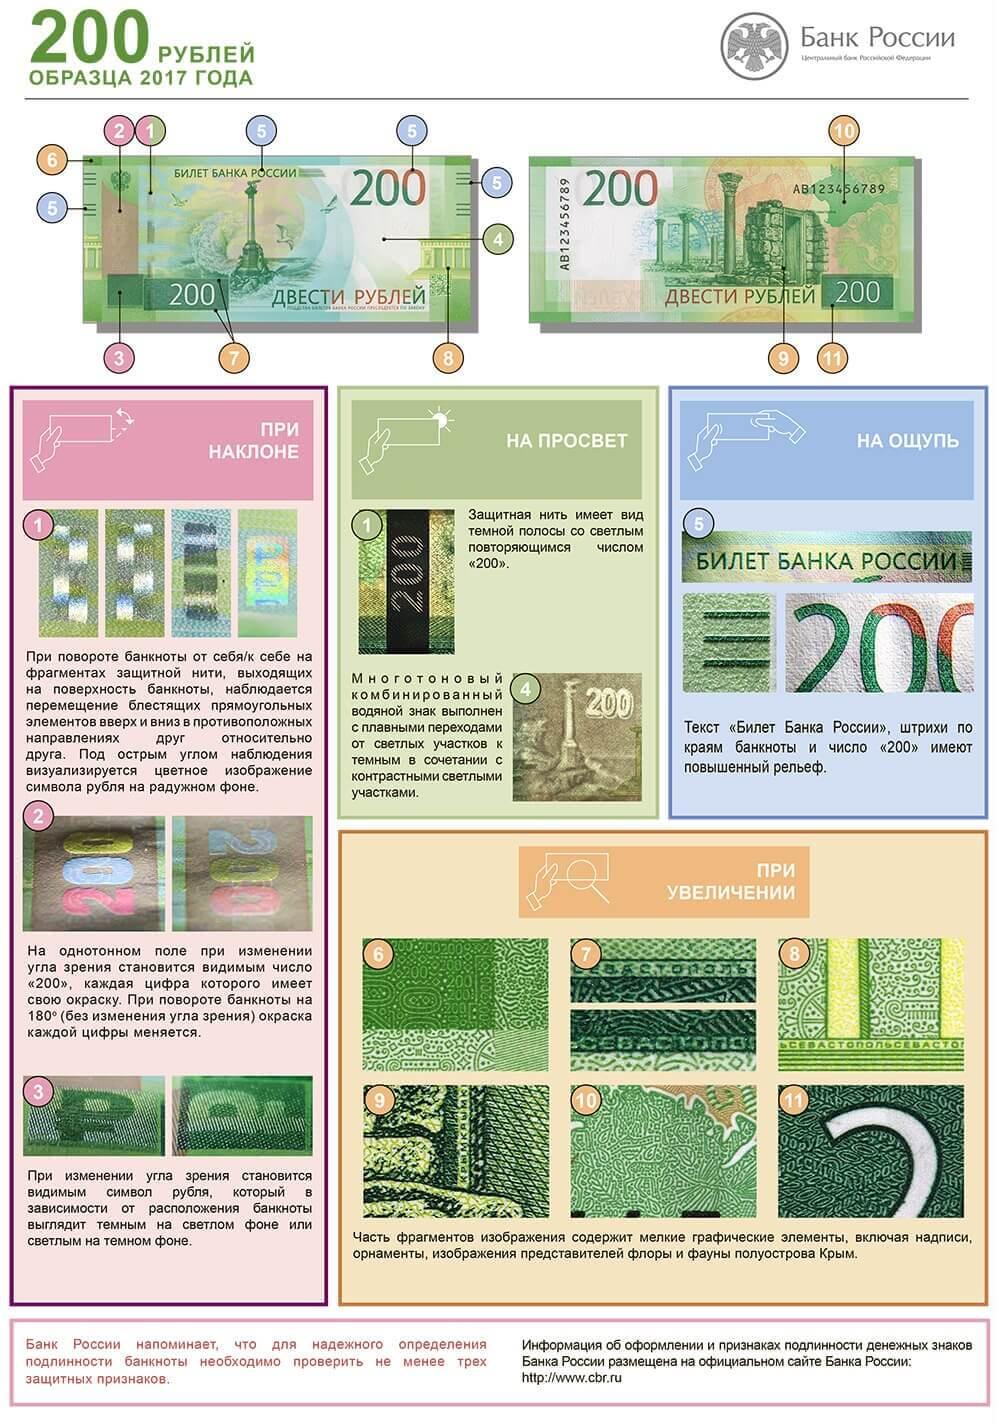 признаки подлинности 200 рублей